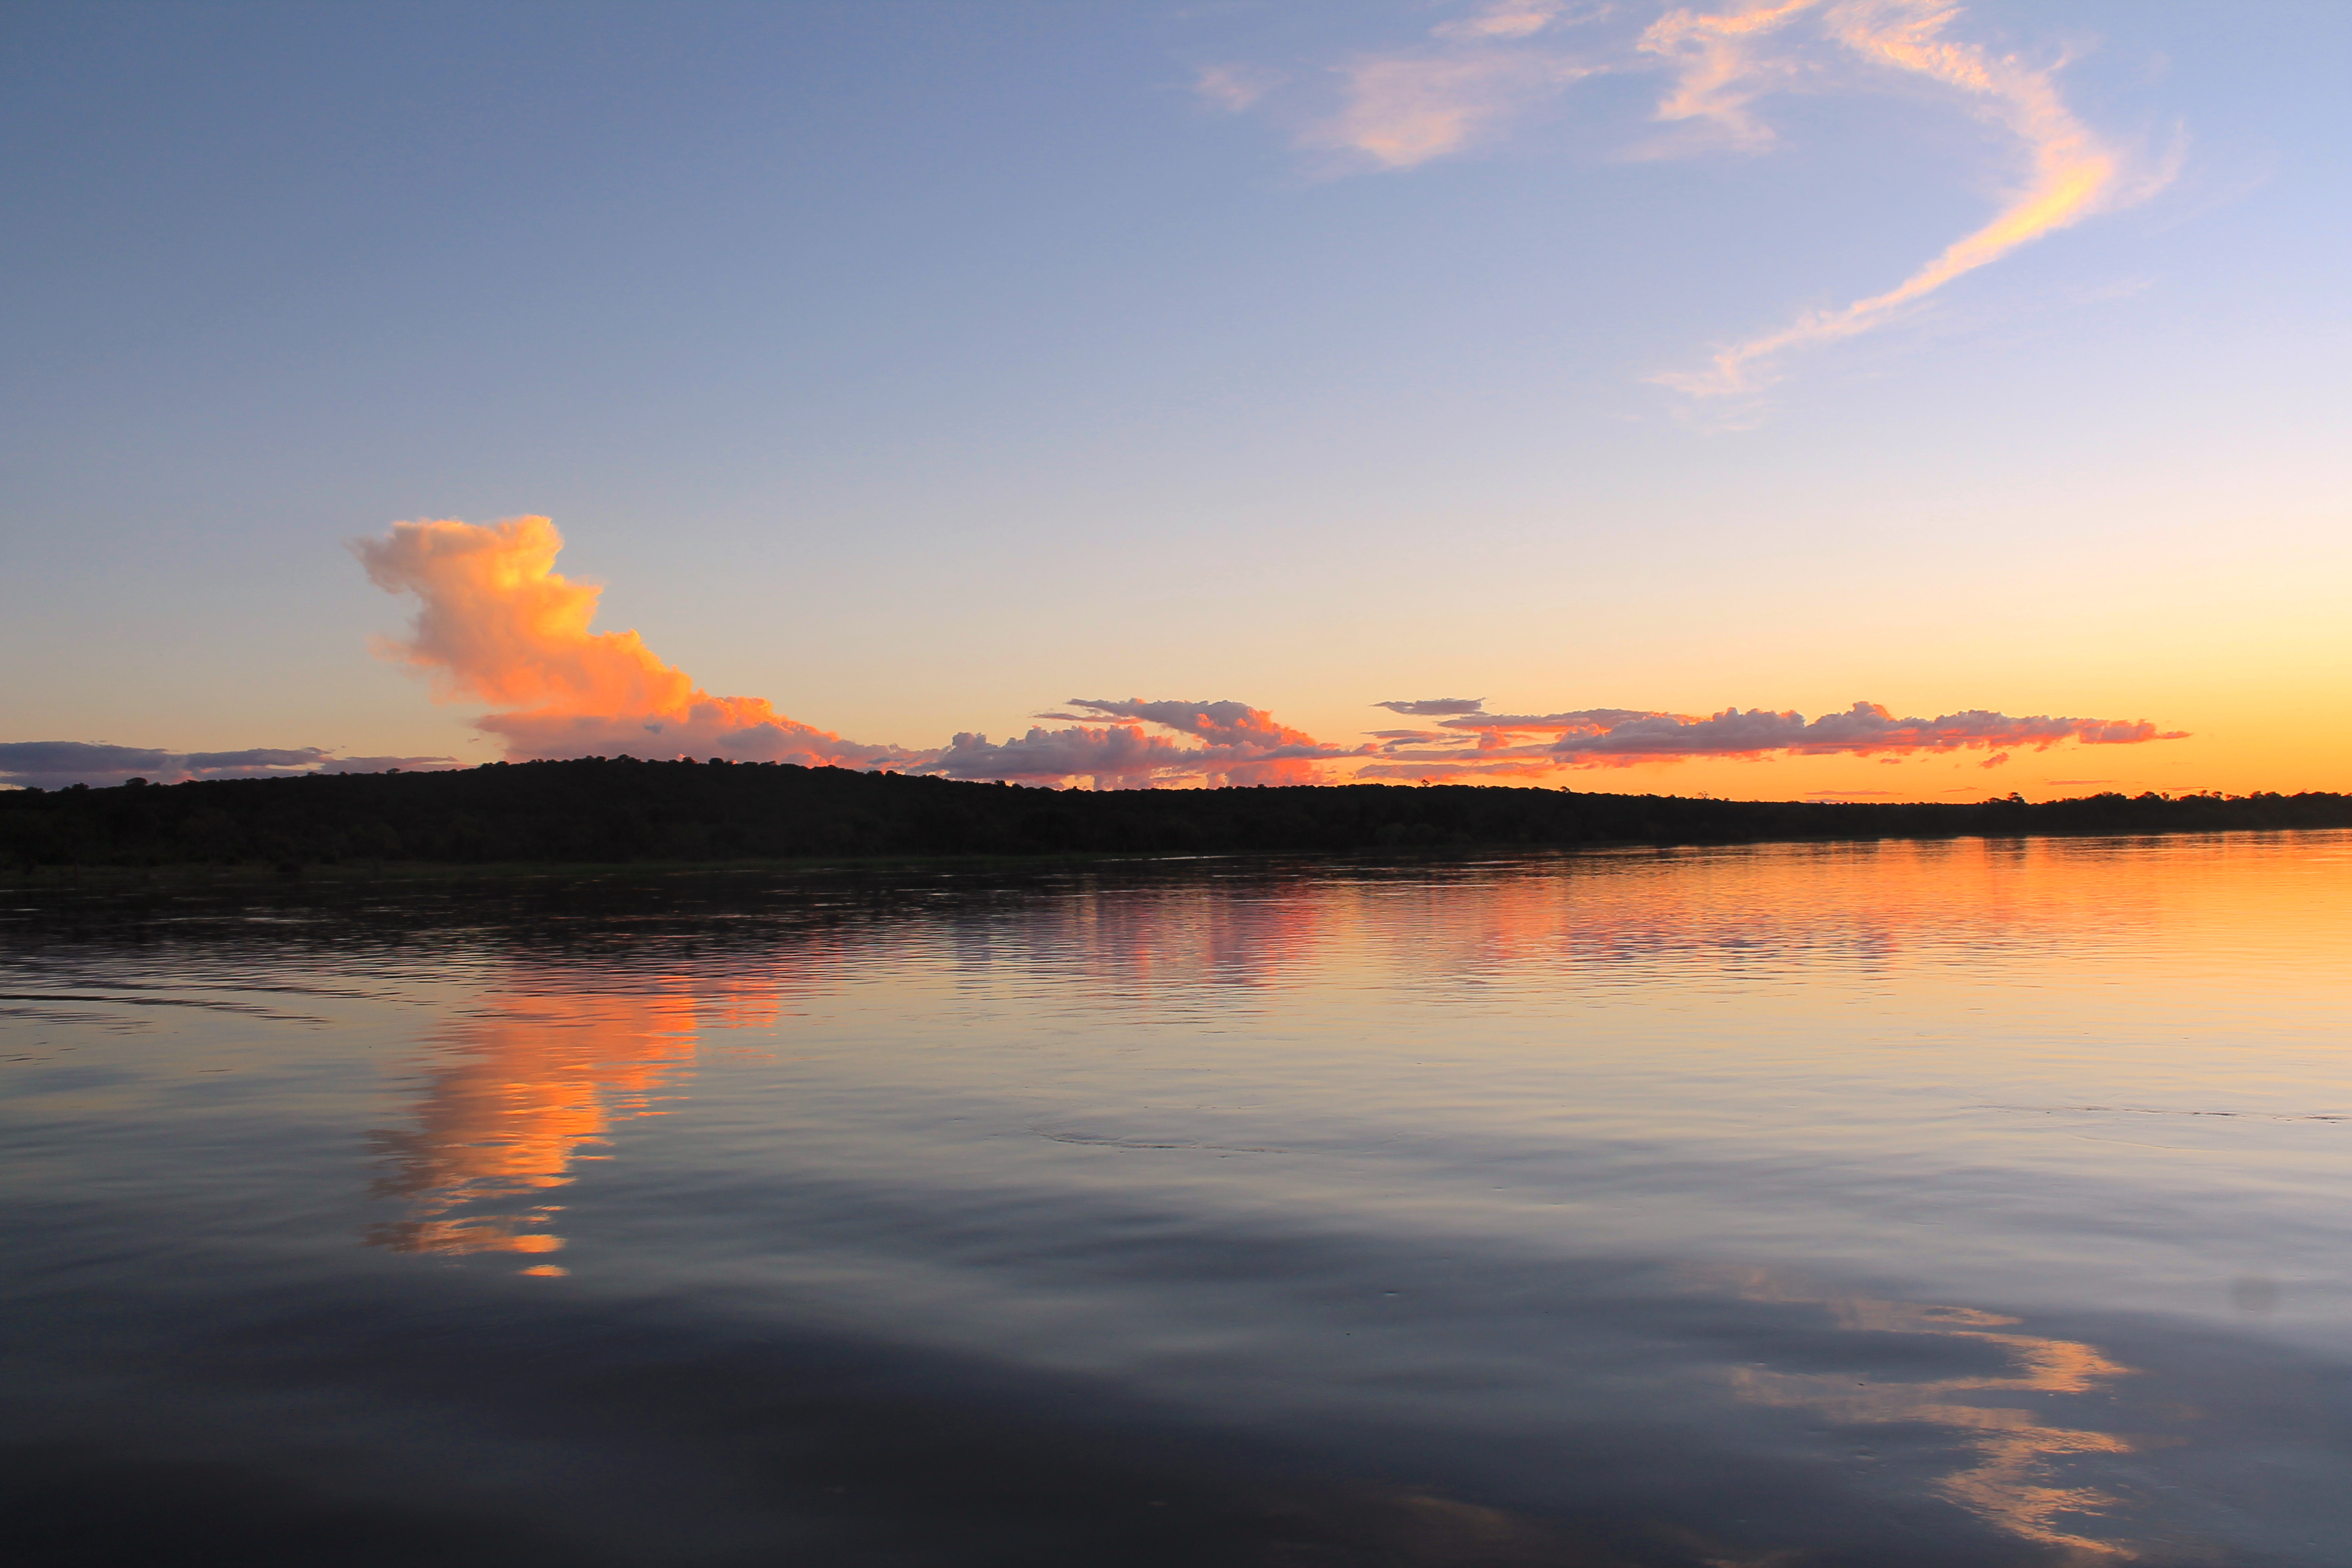 sunset-zambezi-river-royalchundu-lustforthesublime